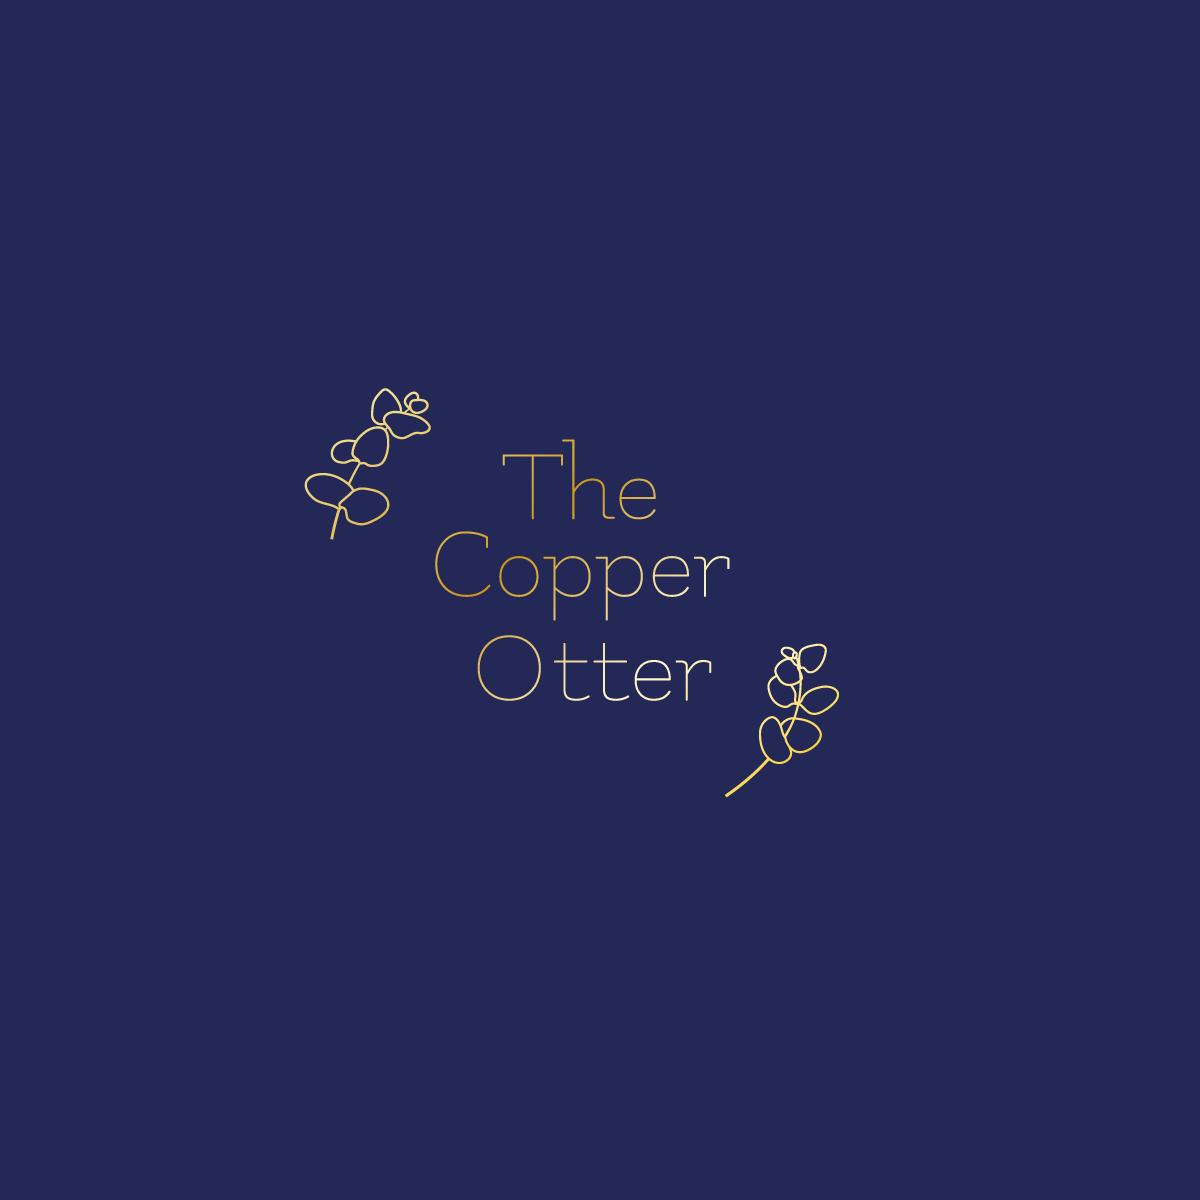 The Copper Otter Logo Design